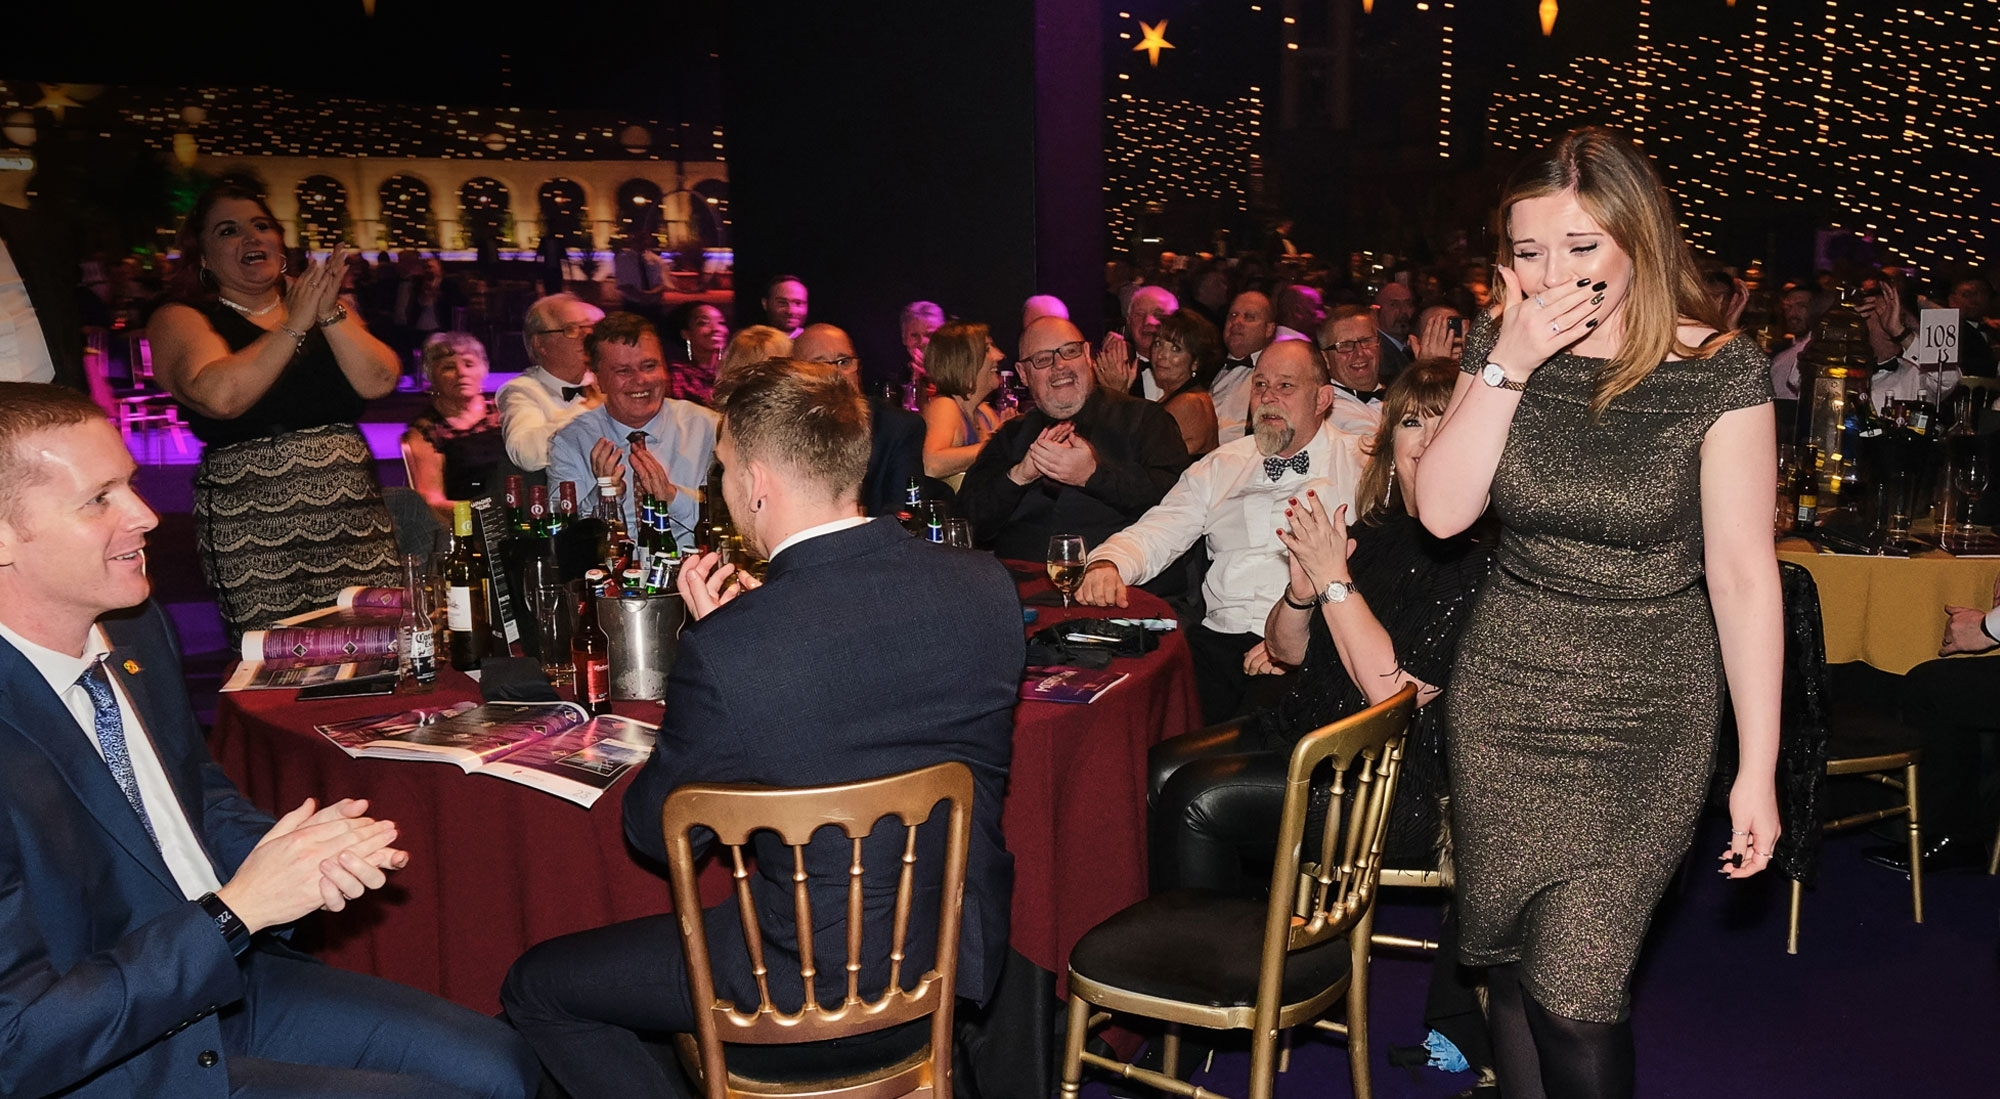 The RailStaff Awards 2021